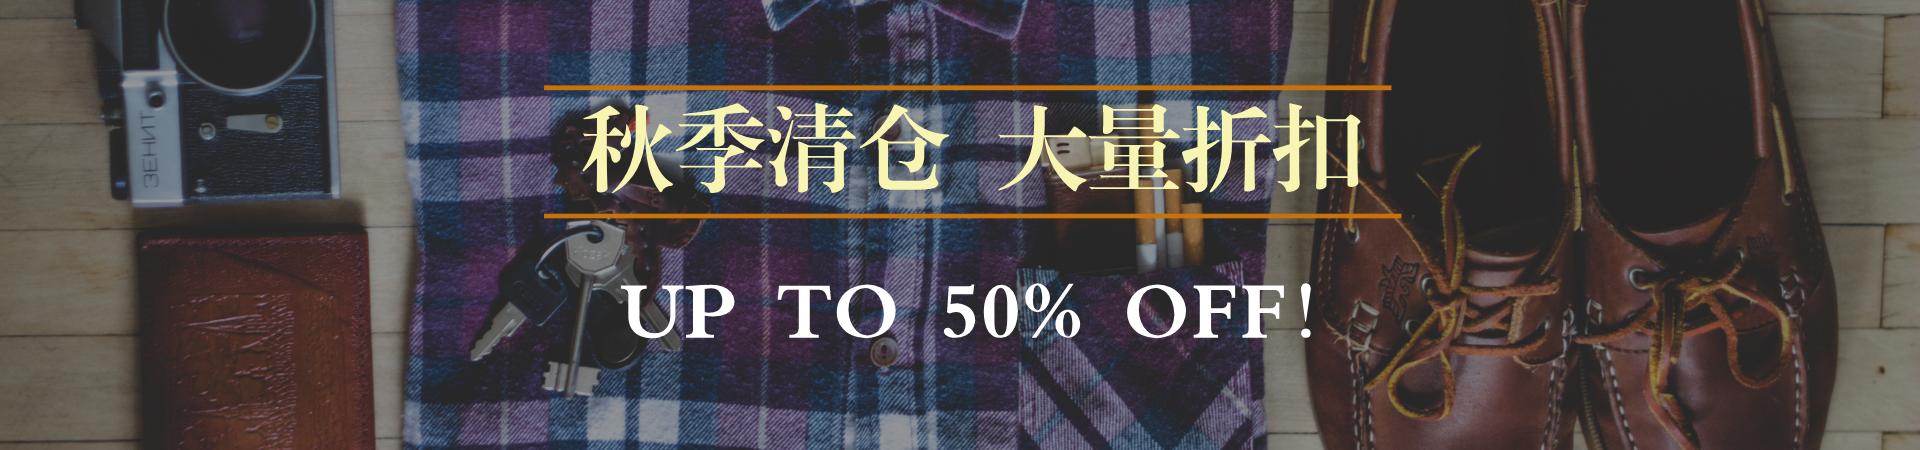 简约大气秋季清仓打折banner